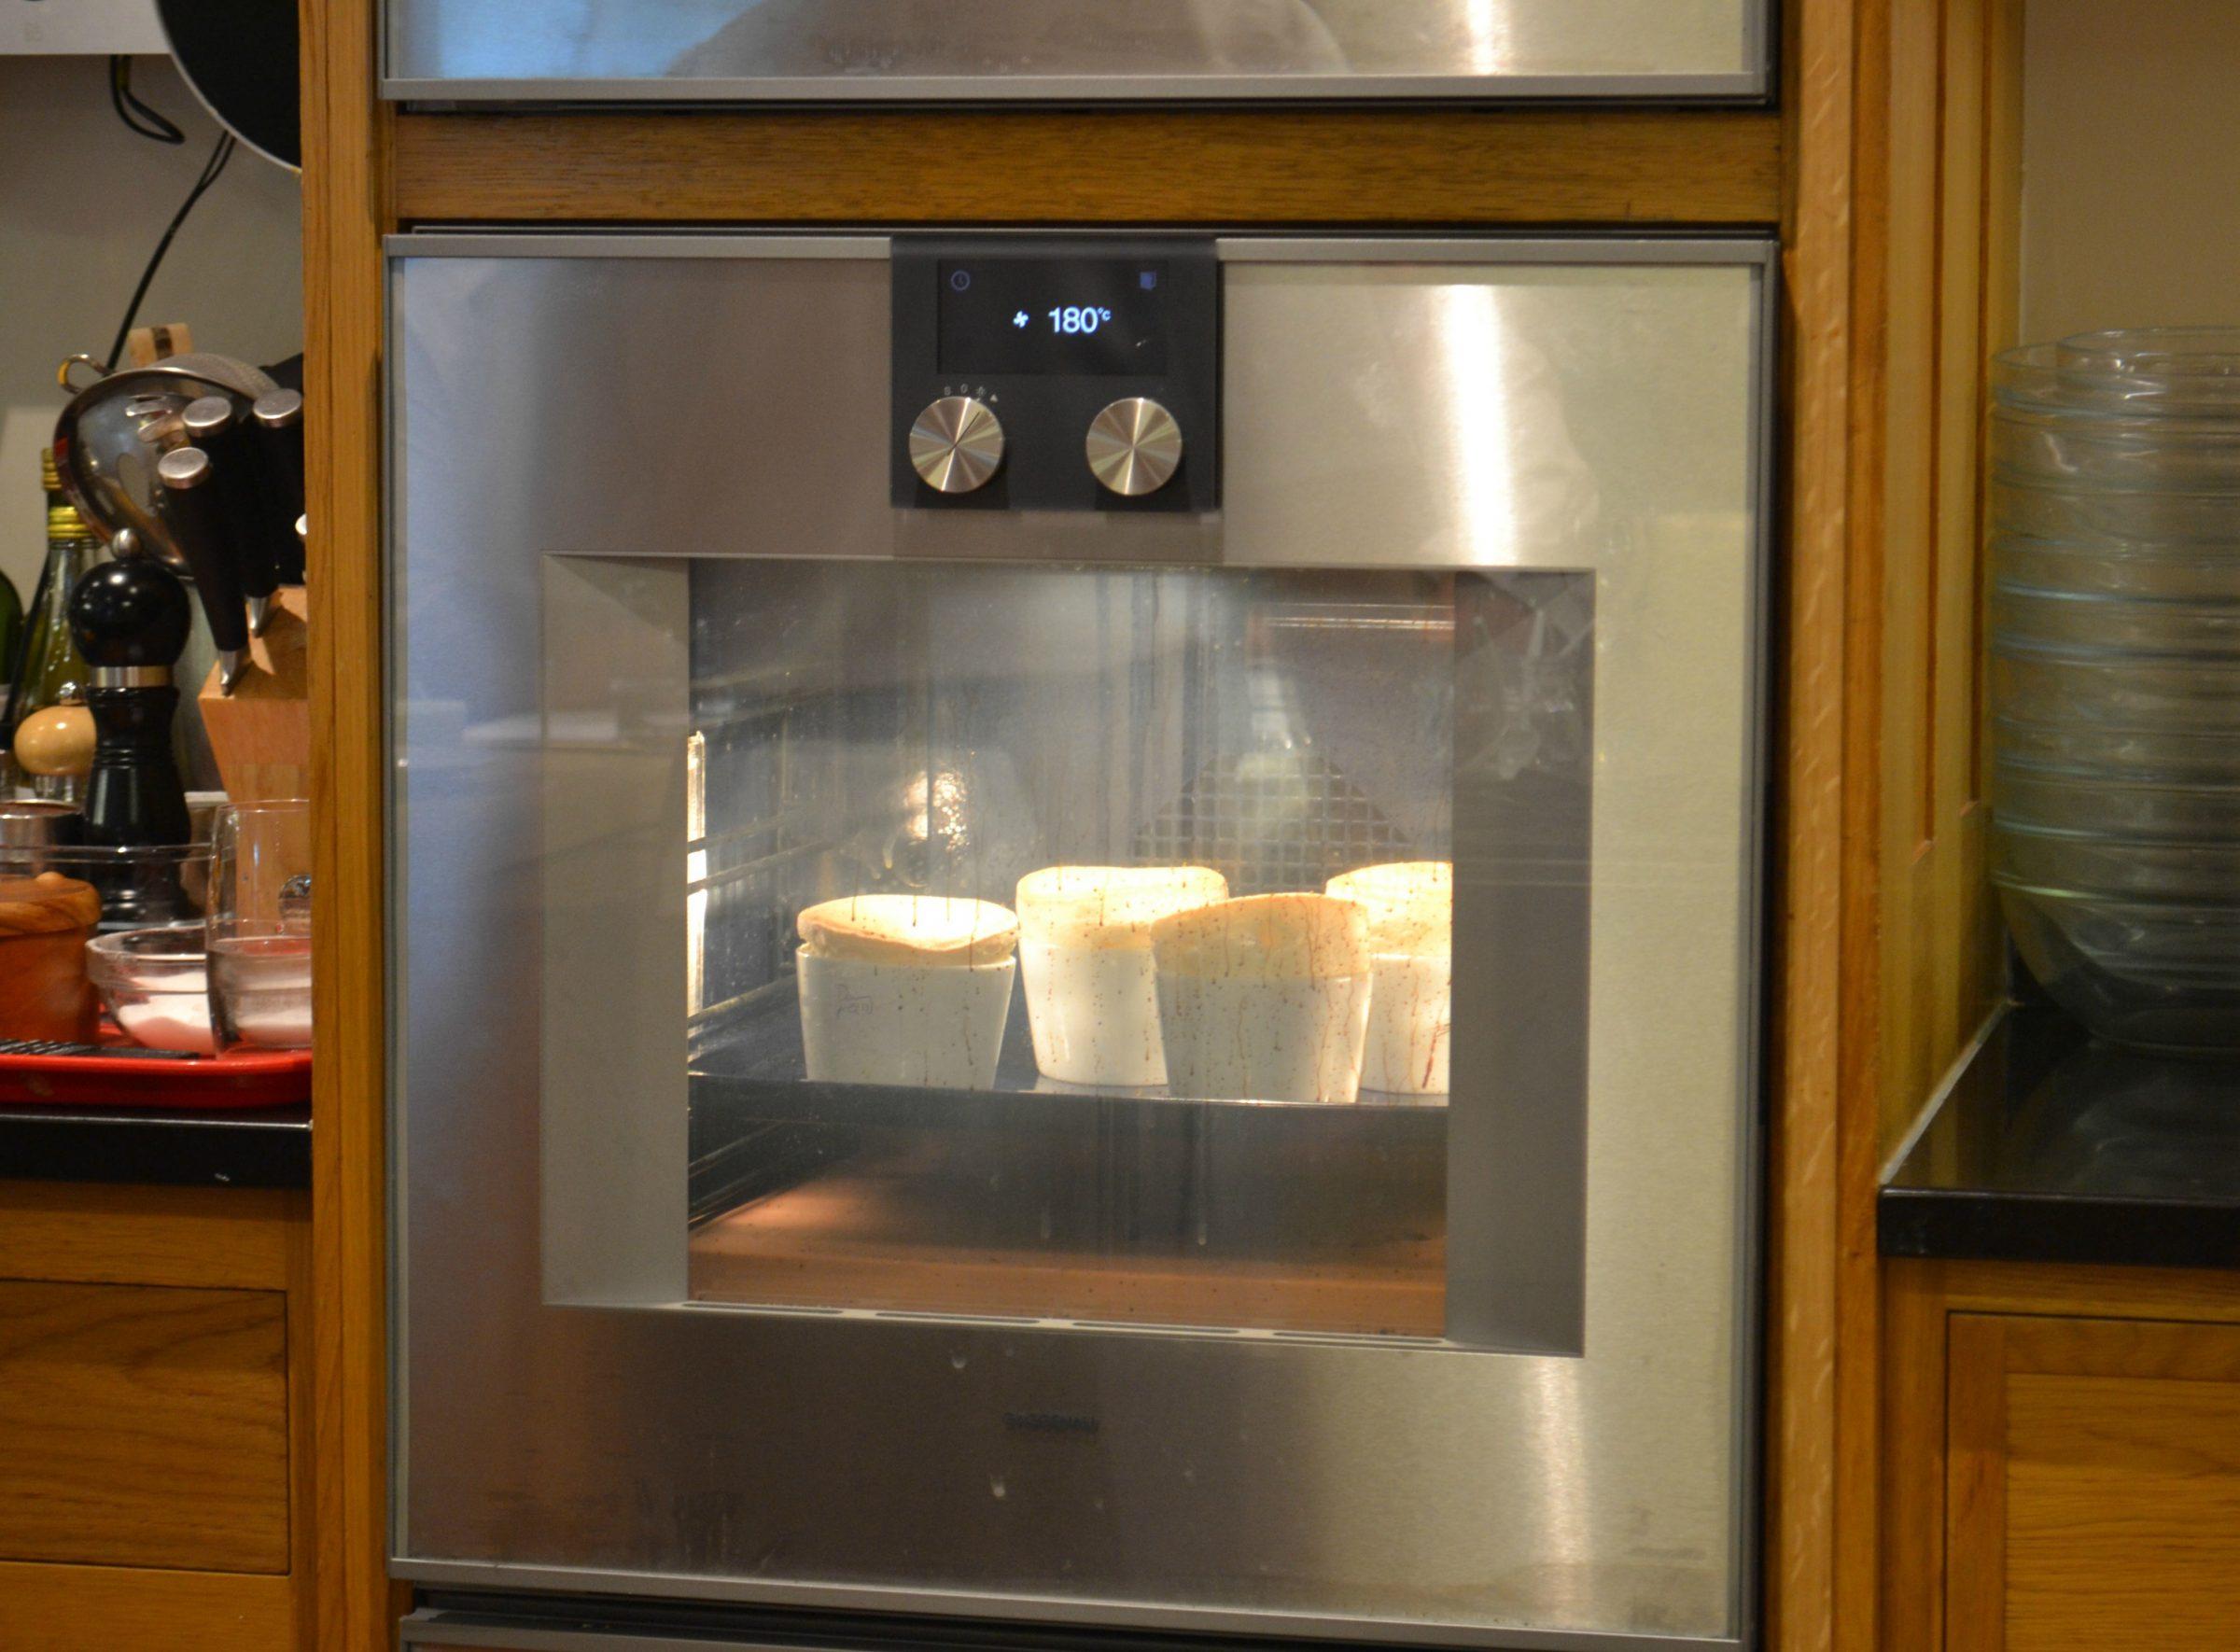 Cooking with Gaggenau - Raymond Blanc Cooker School - Humphrey Munson Blog - Recipes - Souffle 3